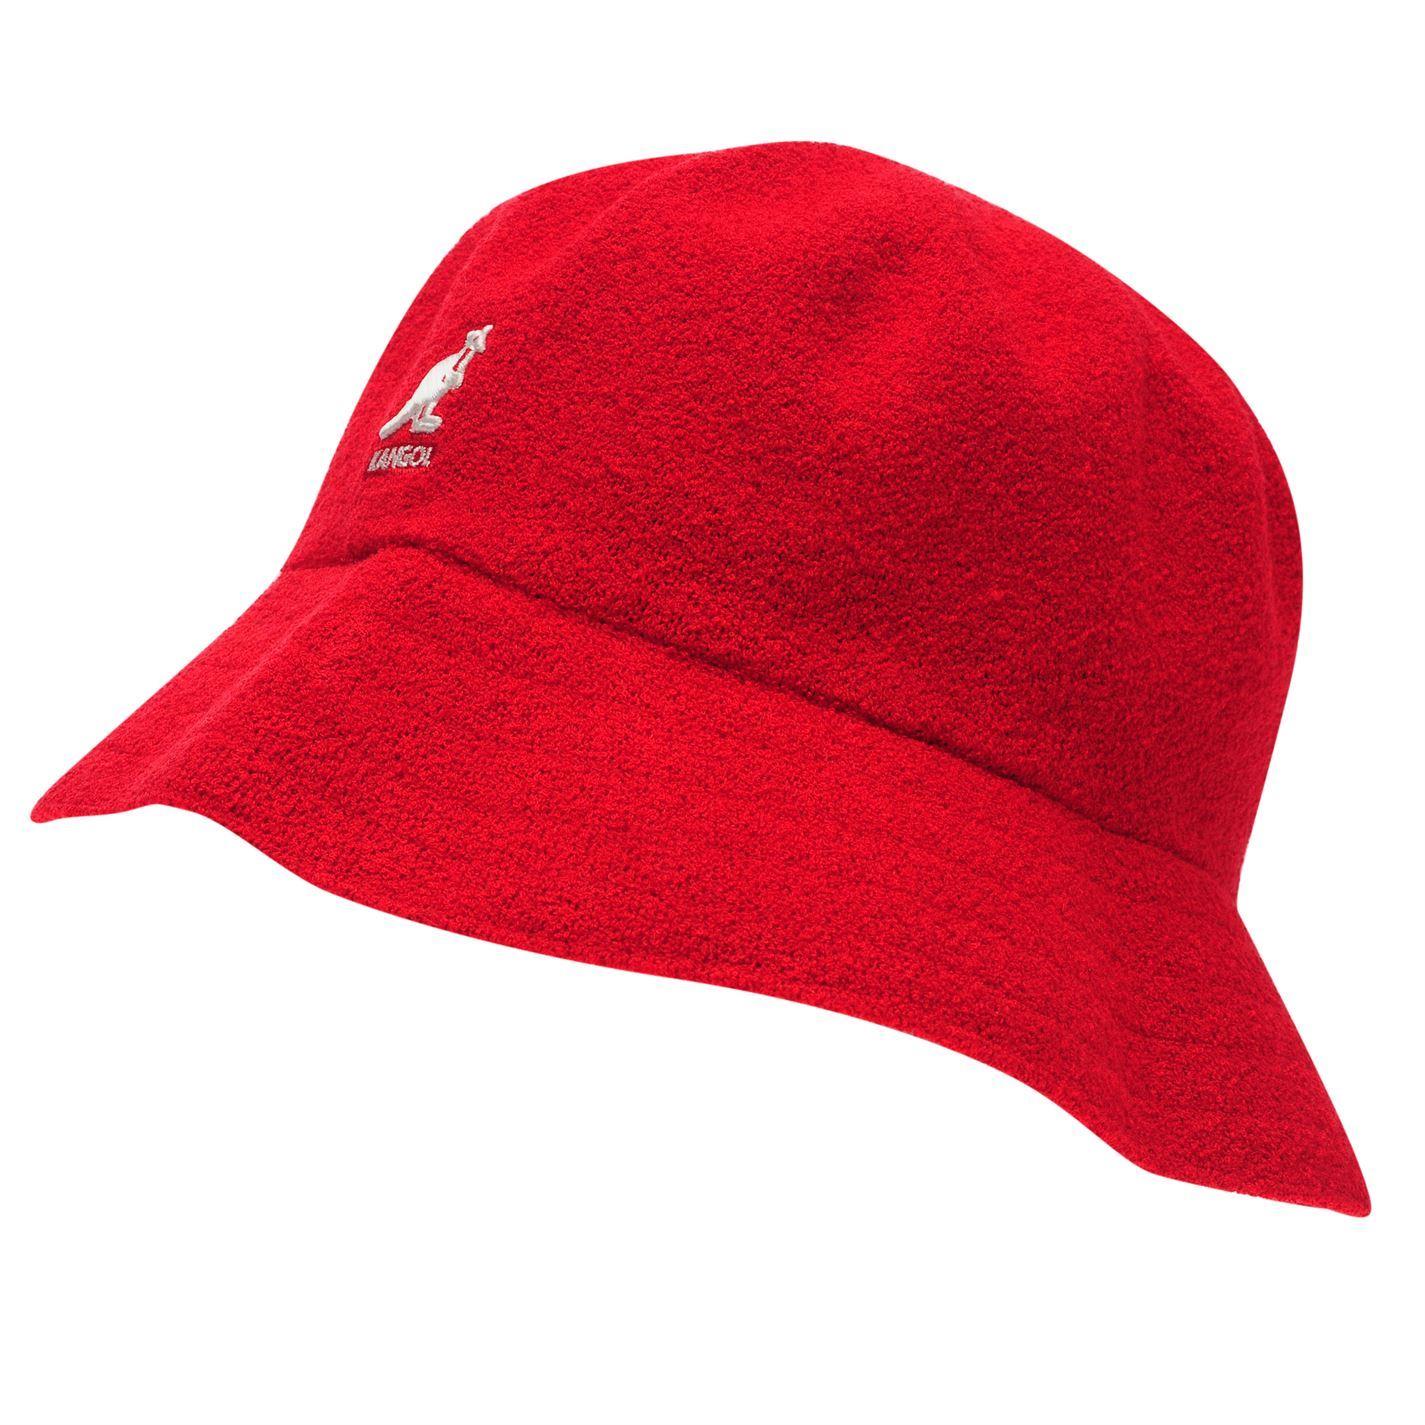 Kangol Boucle Bucket Hat Mens Gents | eBay